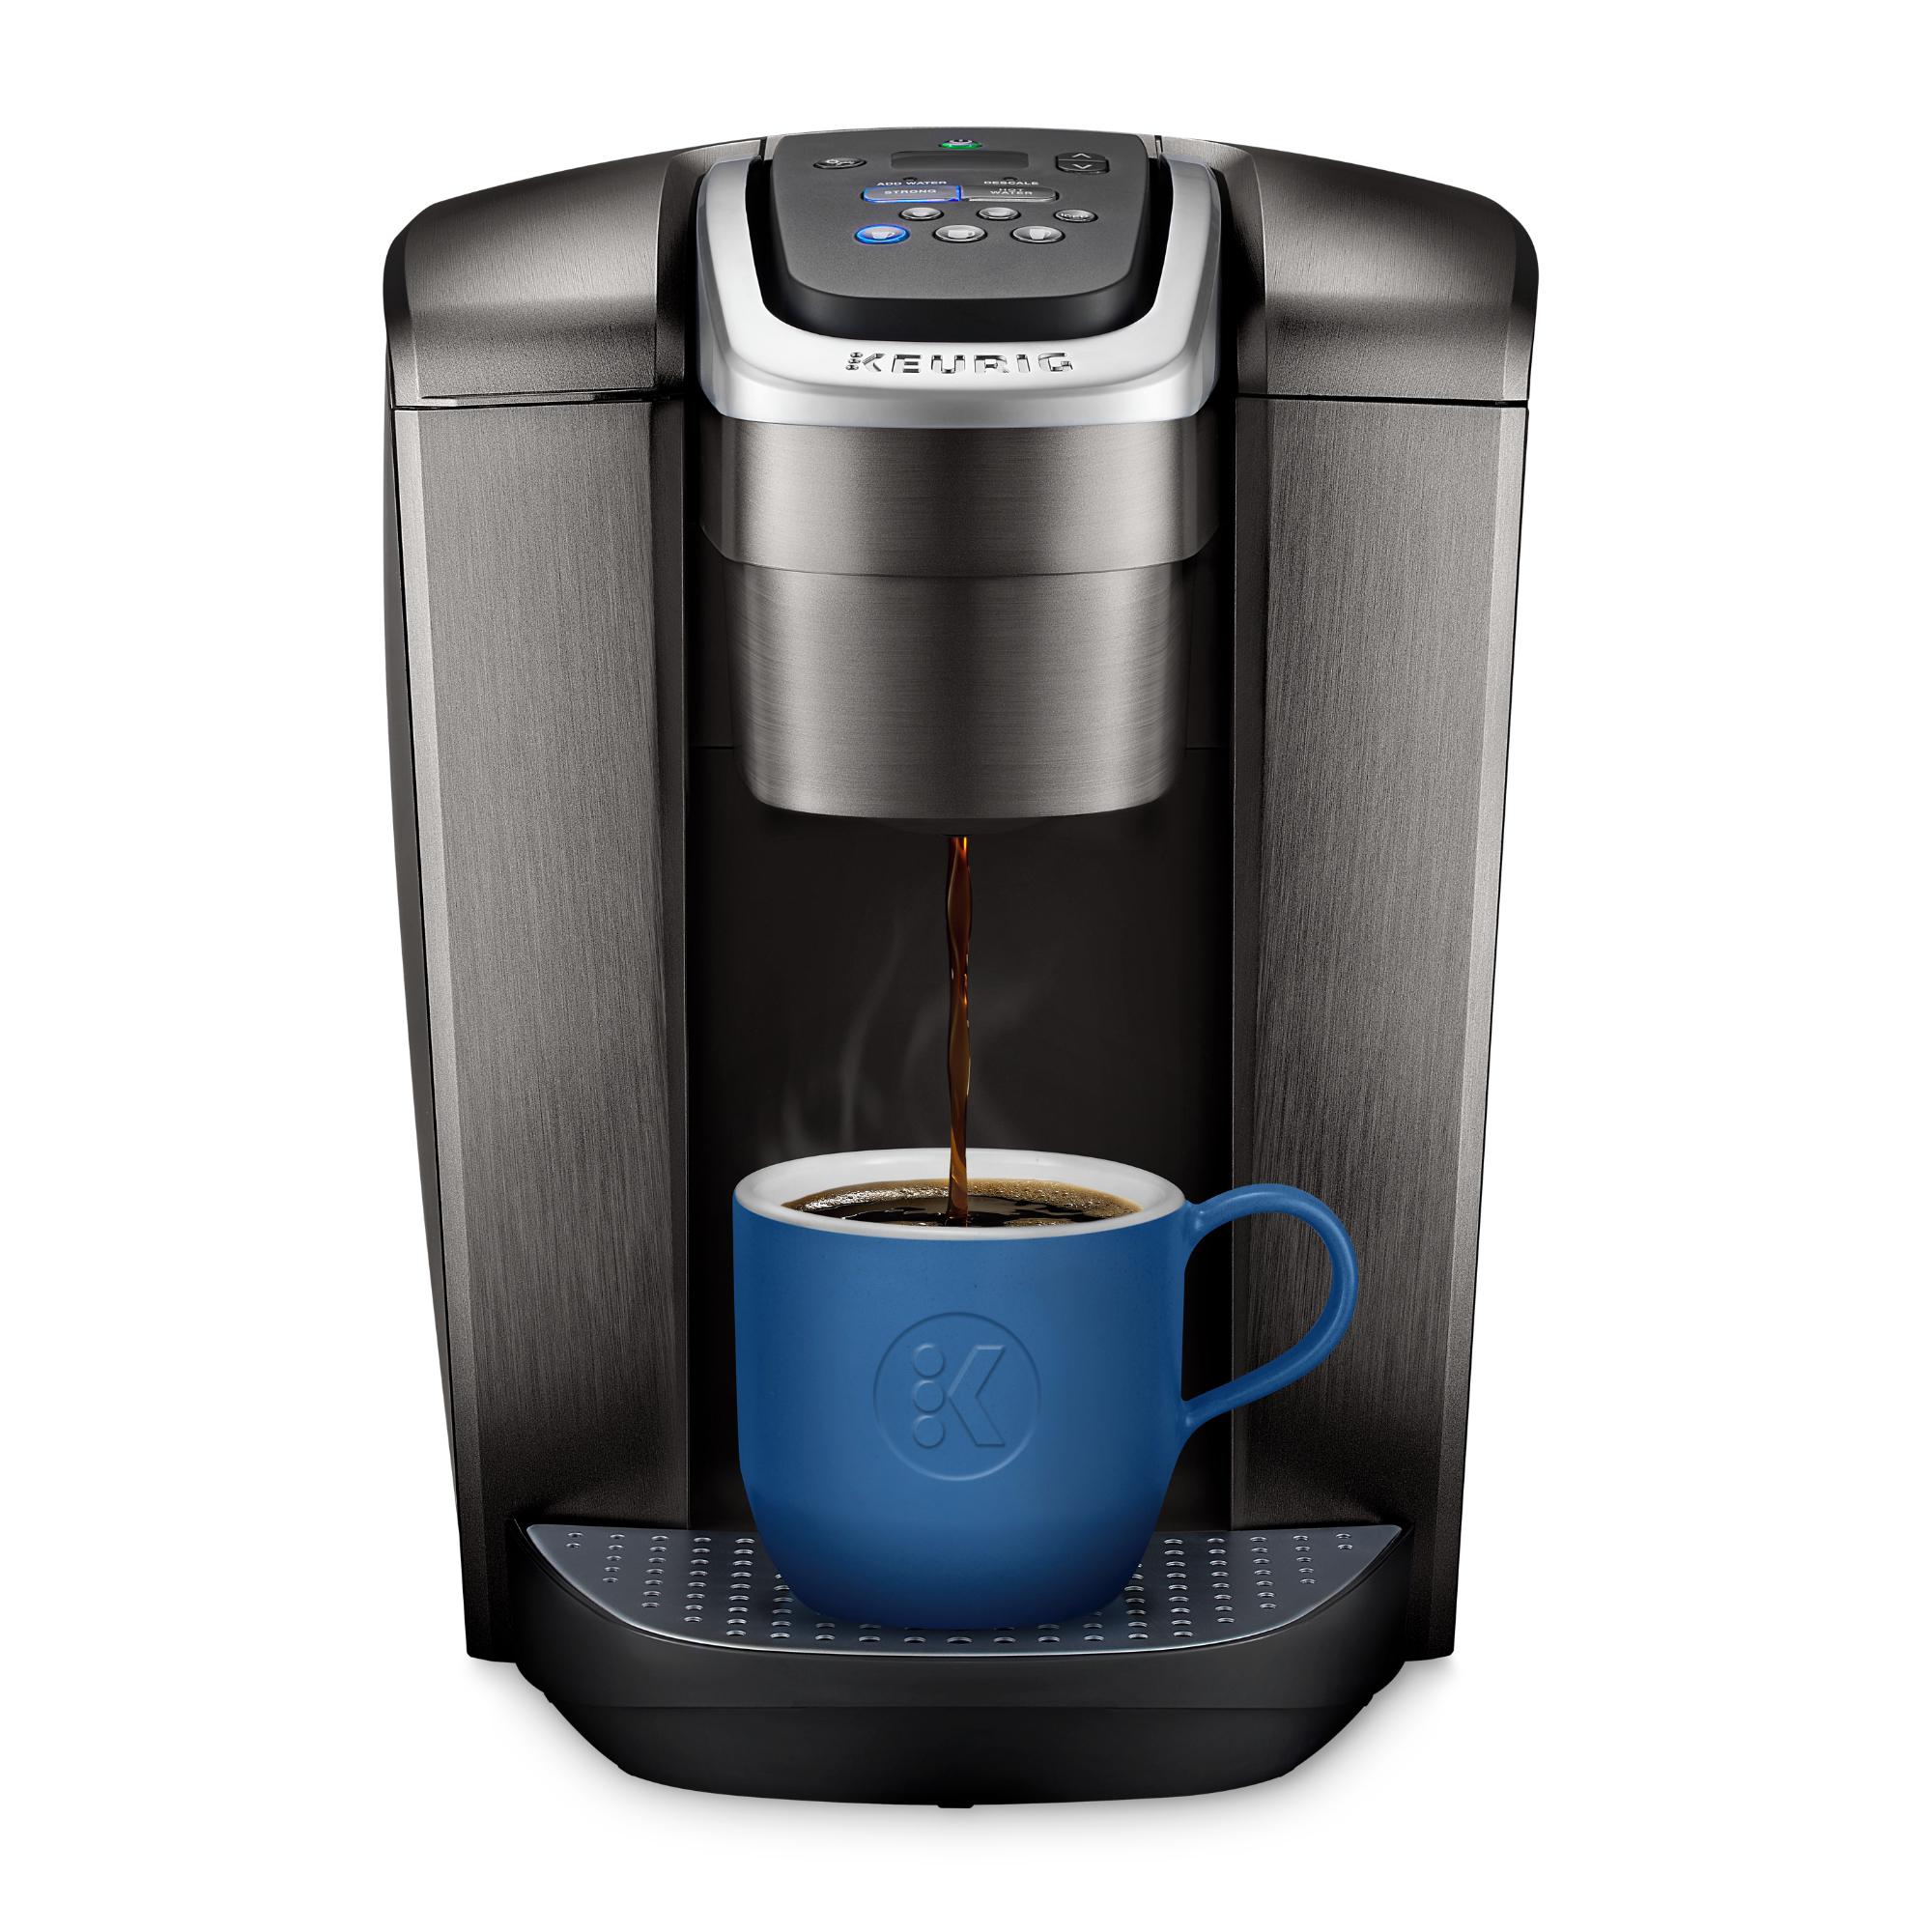 Keurig K-Elite Single-Serve K-Cup Pod Coffee Maker with Iced Coffee Setting - Brushed Slate